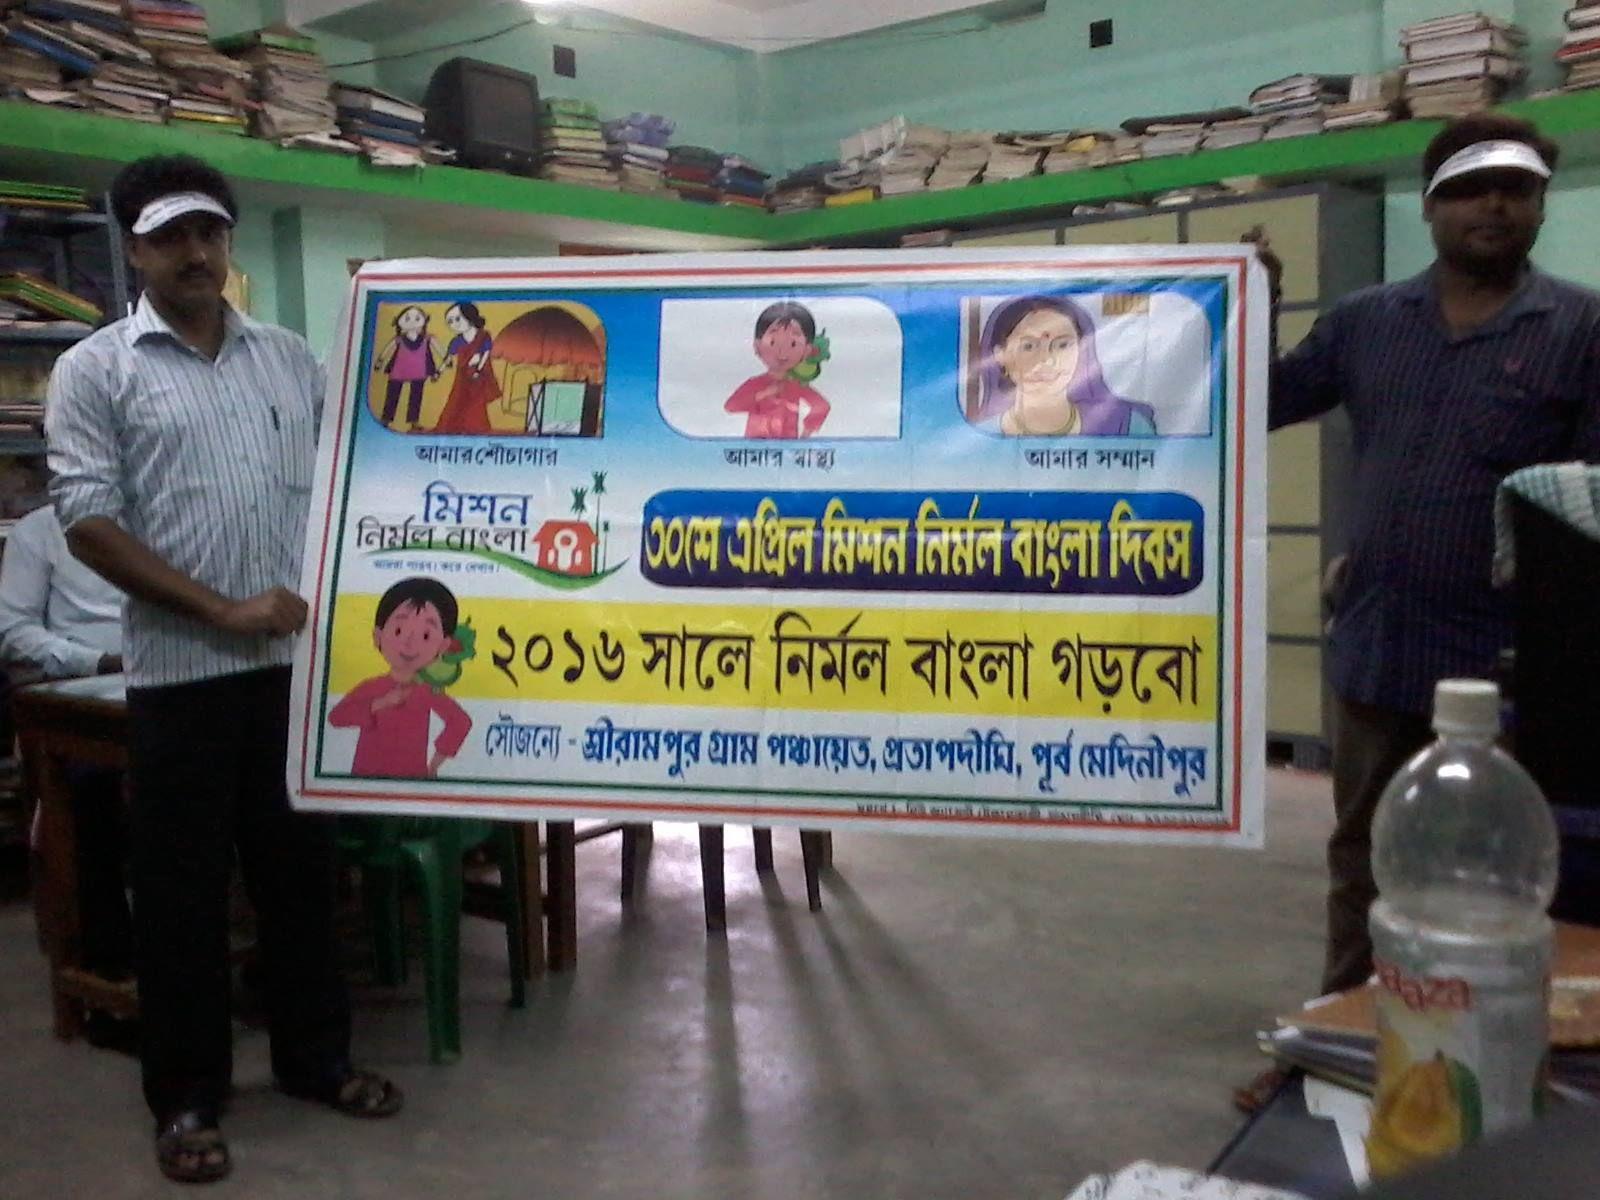 Nirmal Bangla Diwas creative banner ready by Srirampur Gram 1600x1200